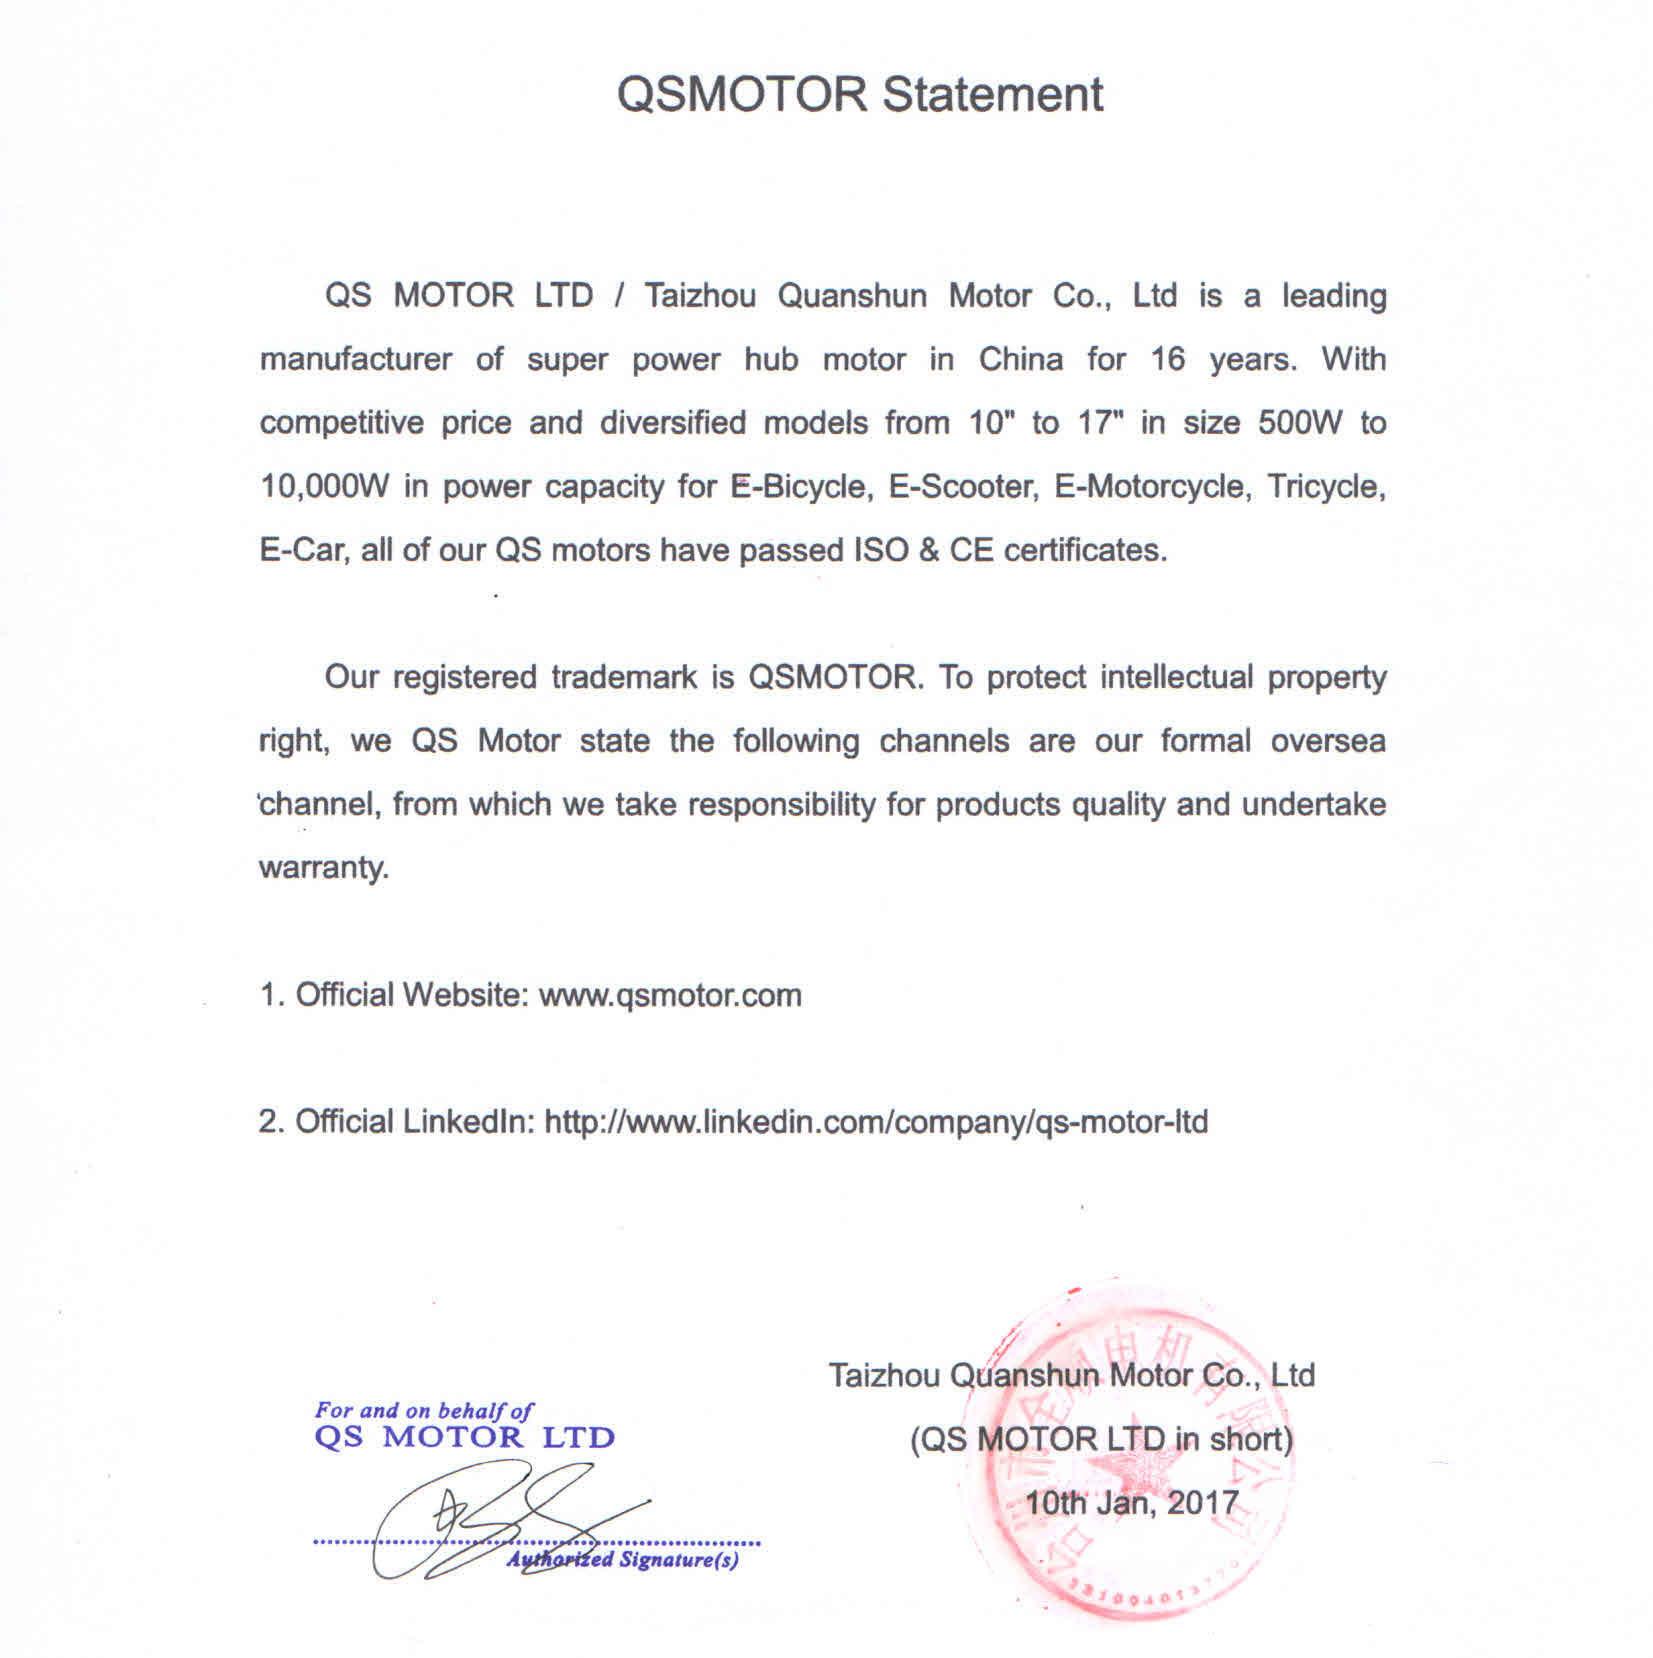 QS Motor Statement